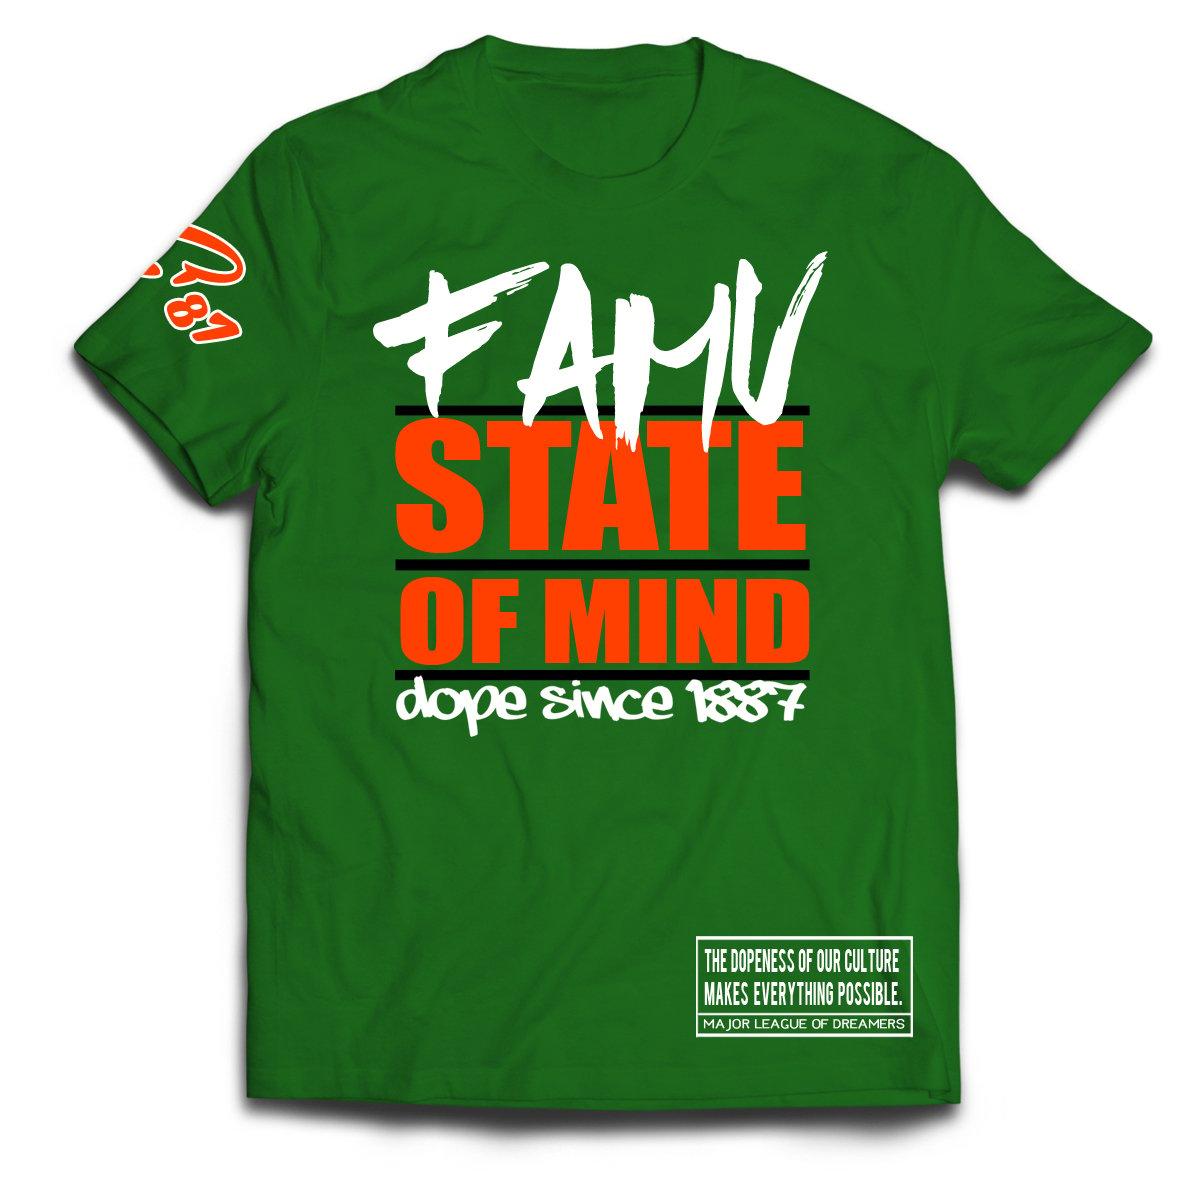 Image of FAMU STATE OF MIND T-SHIRT